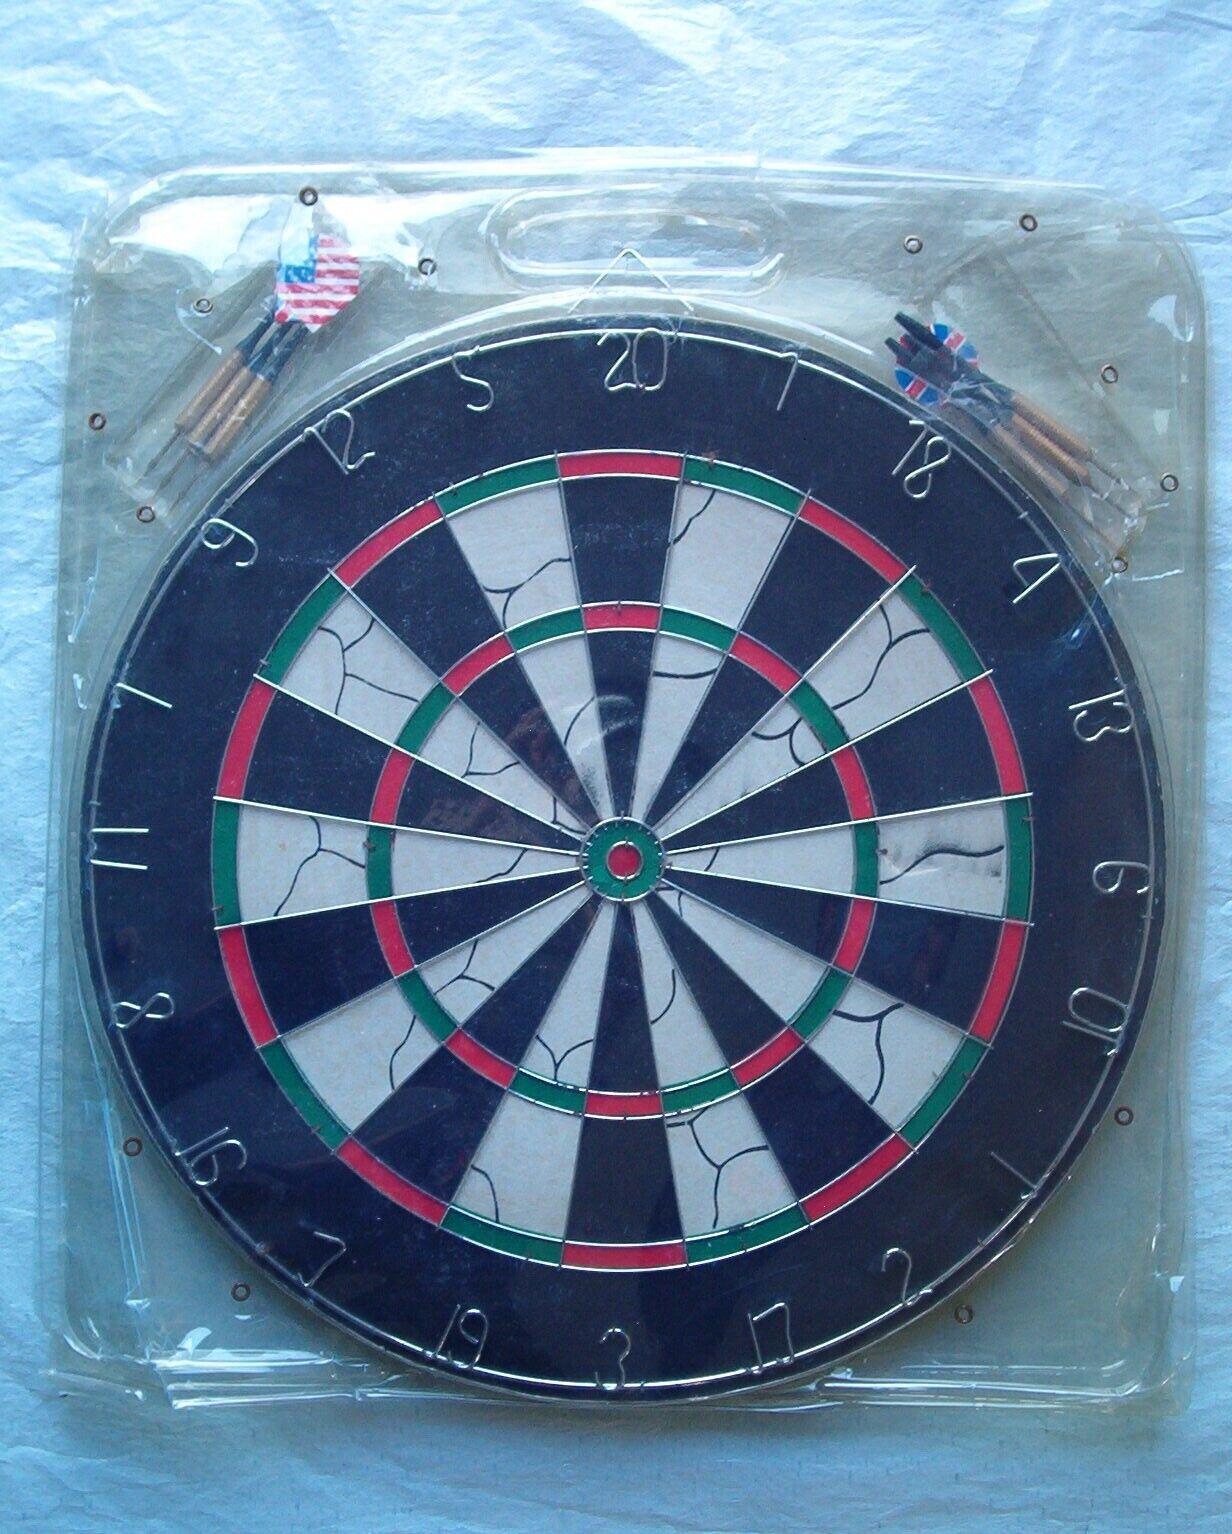 game room dart set with 6 steel